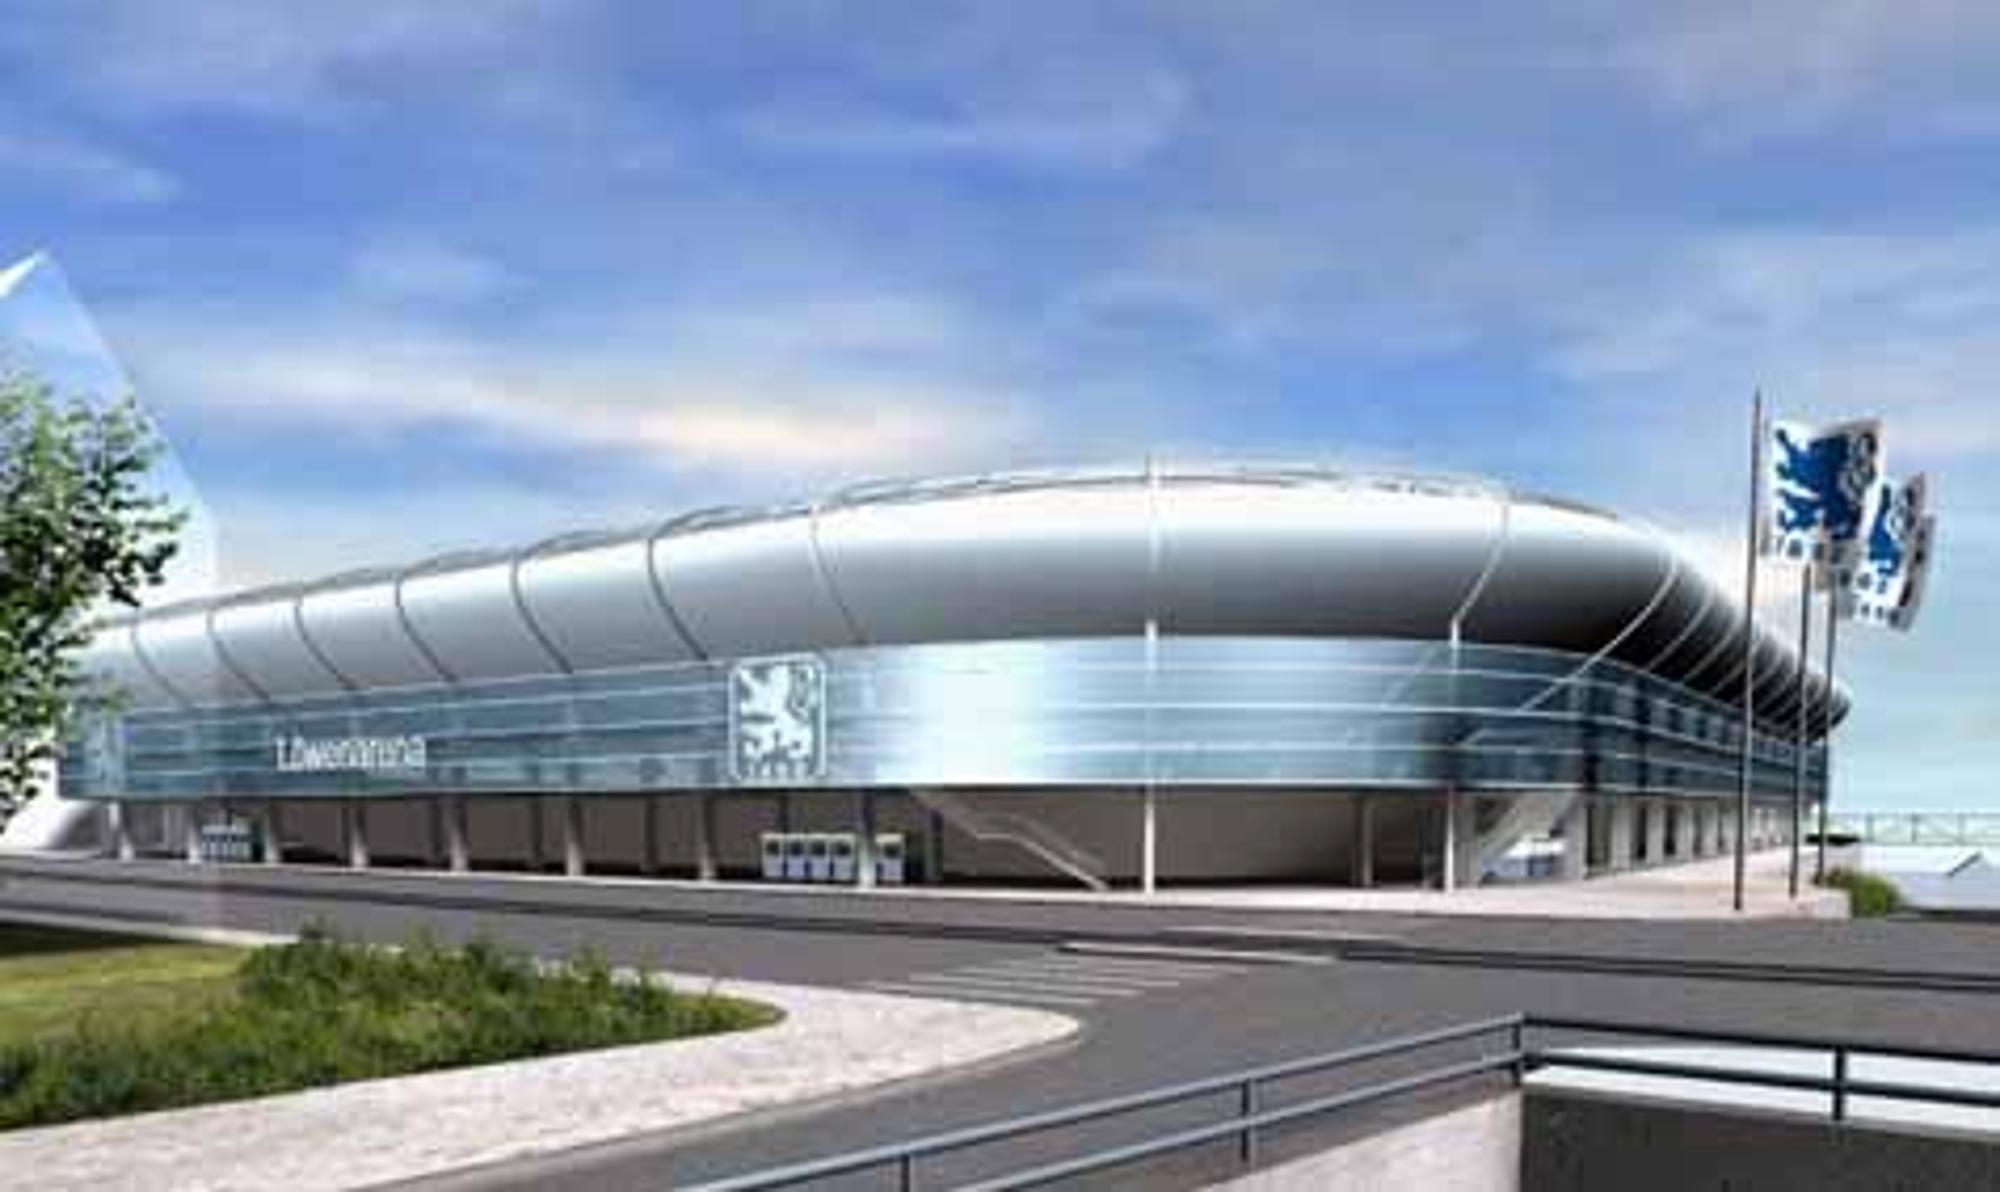 2028060136-gruenwalder-stadion-modell-zukunft-OkHG.jpg